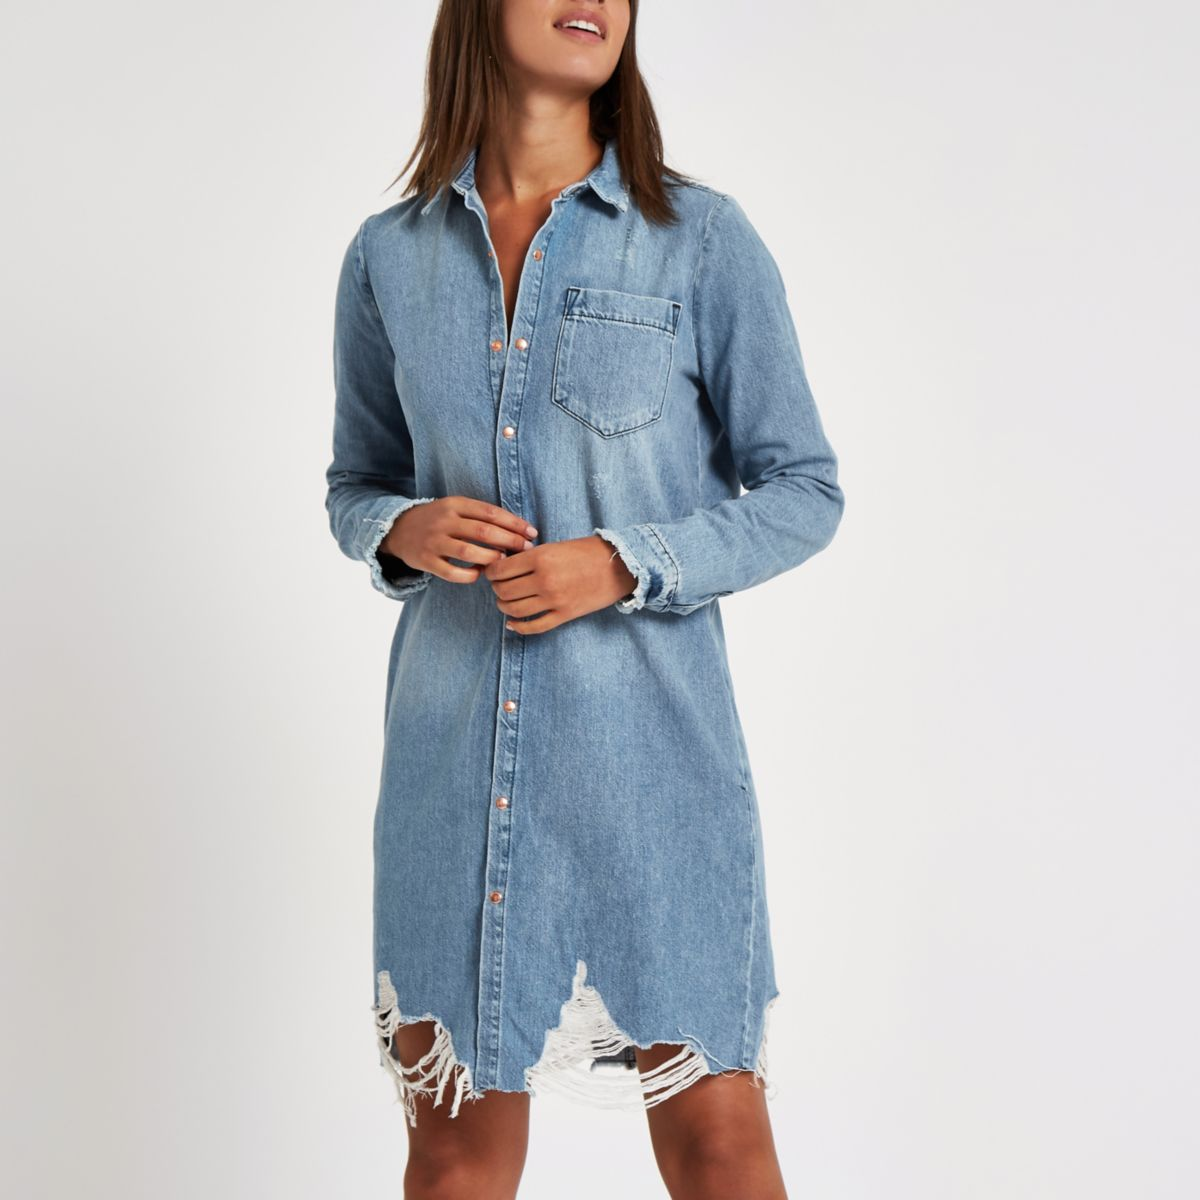 Blue ripped denim shirt dress